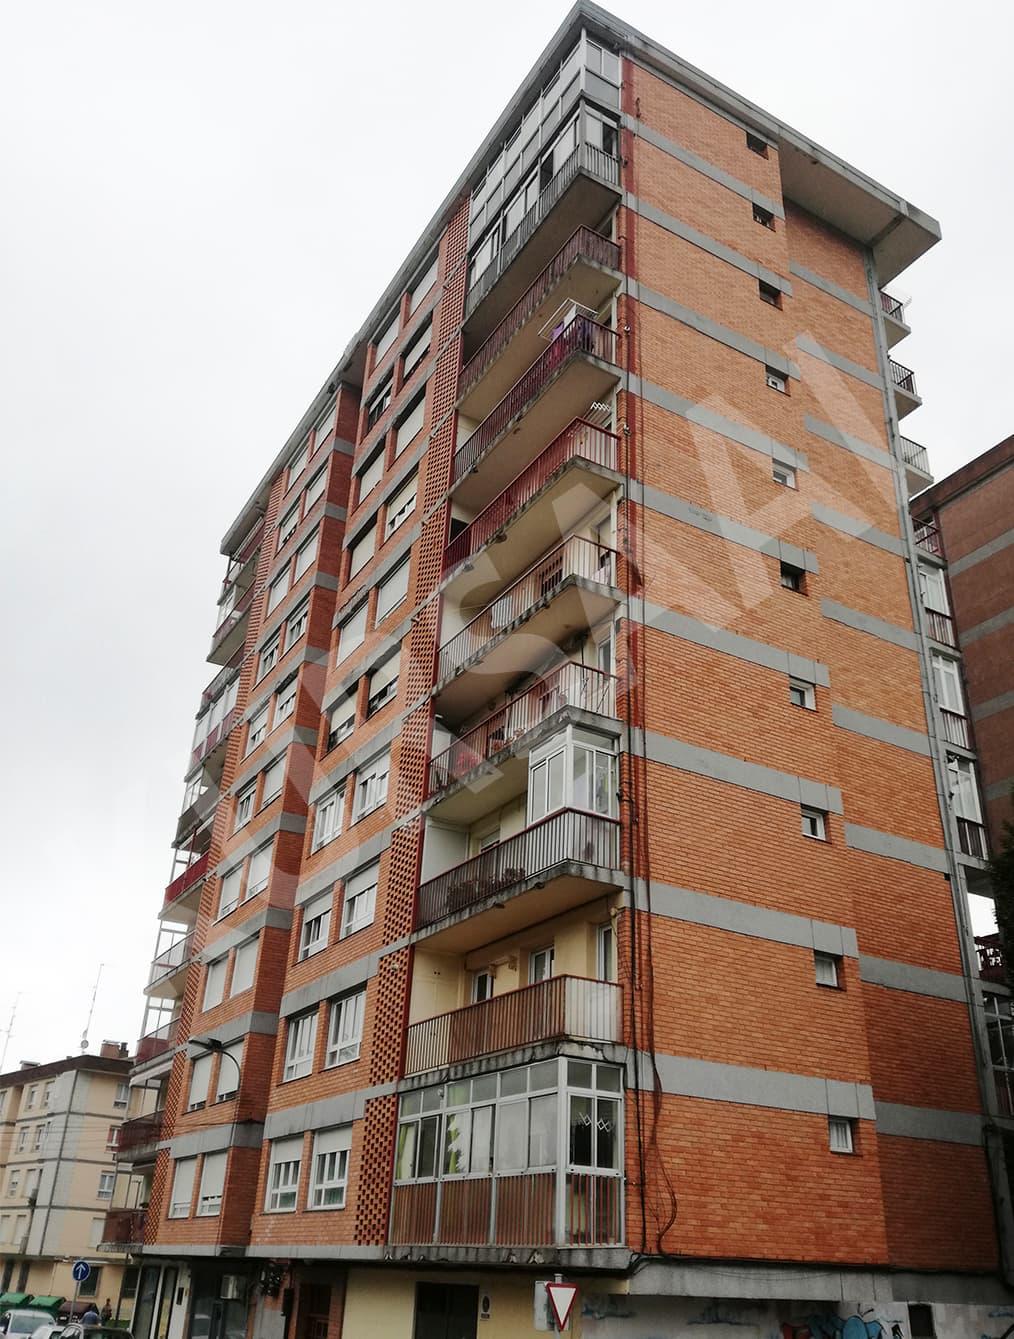 foto 3 - Aislamientos Térmicos y Eficiencia Energética-Arbesko Errota, 10-IRUN, GIPUZKOA